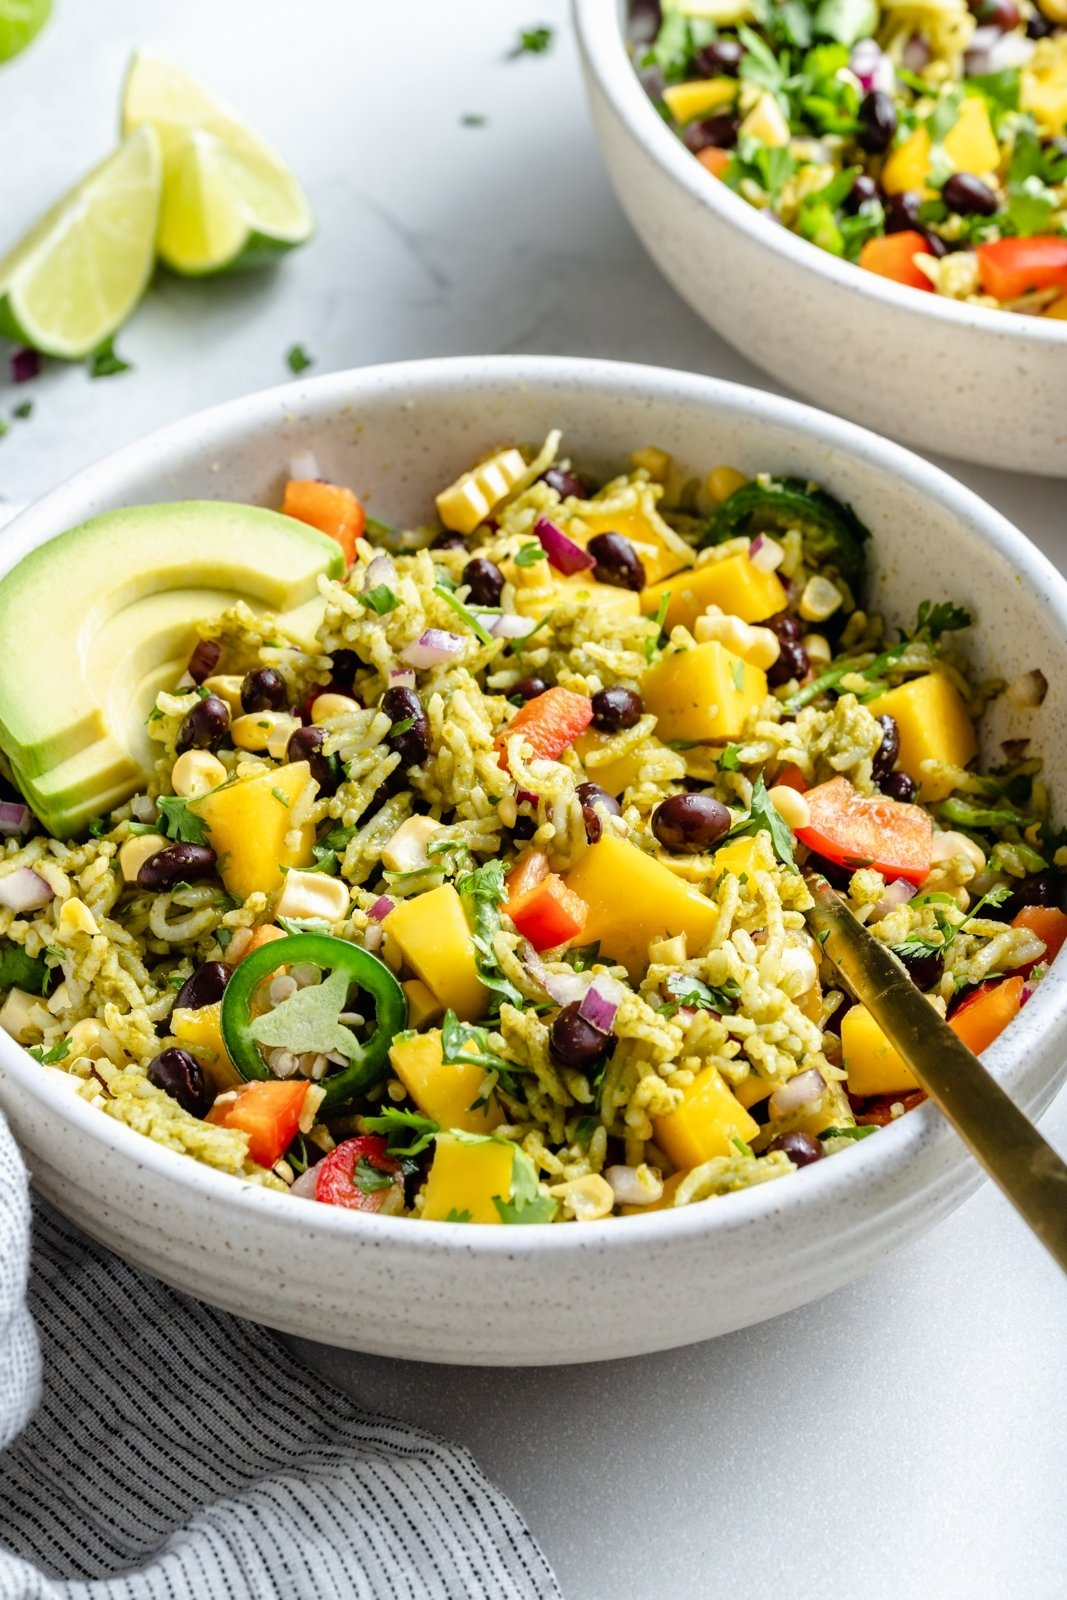 healthy green rice burrito bowl with avocado and mango